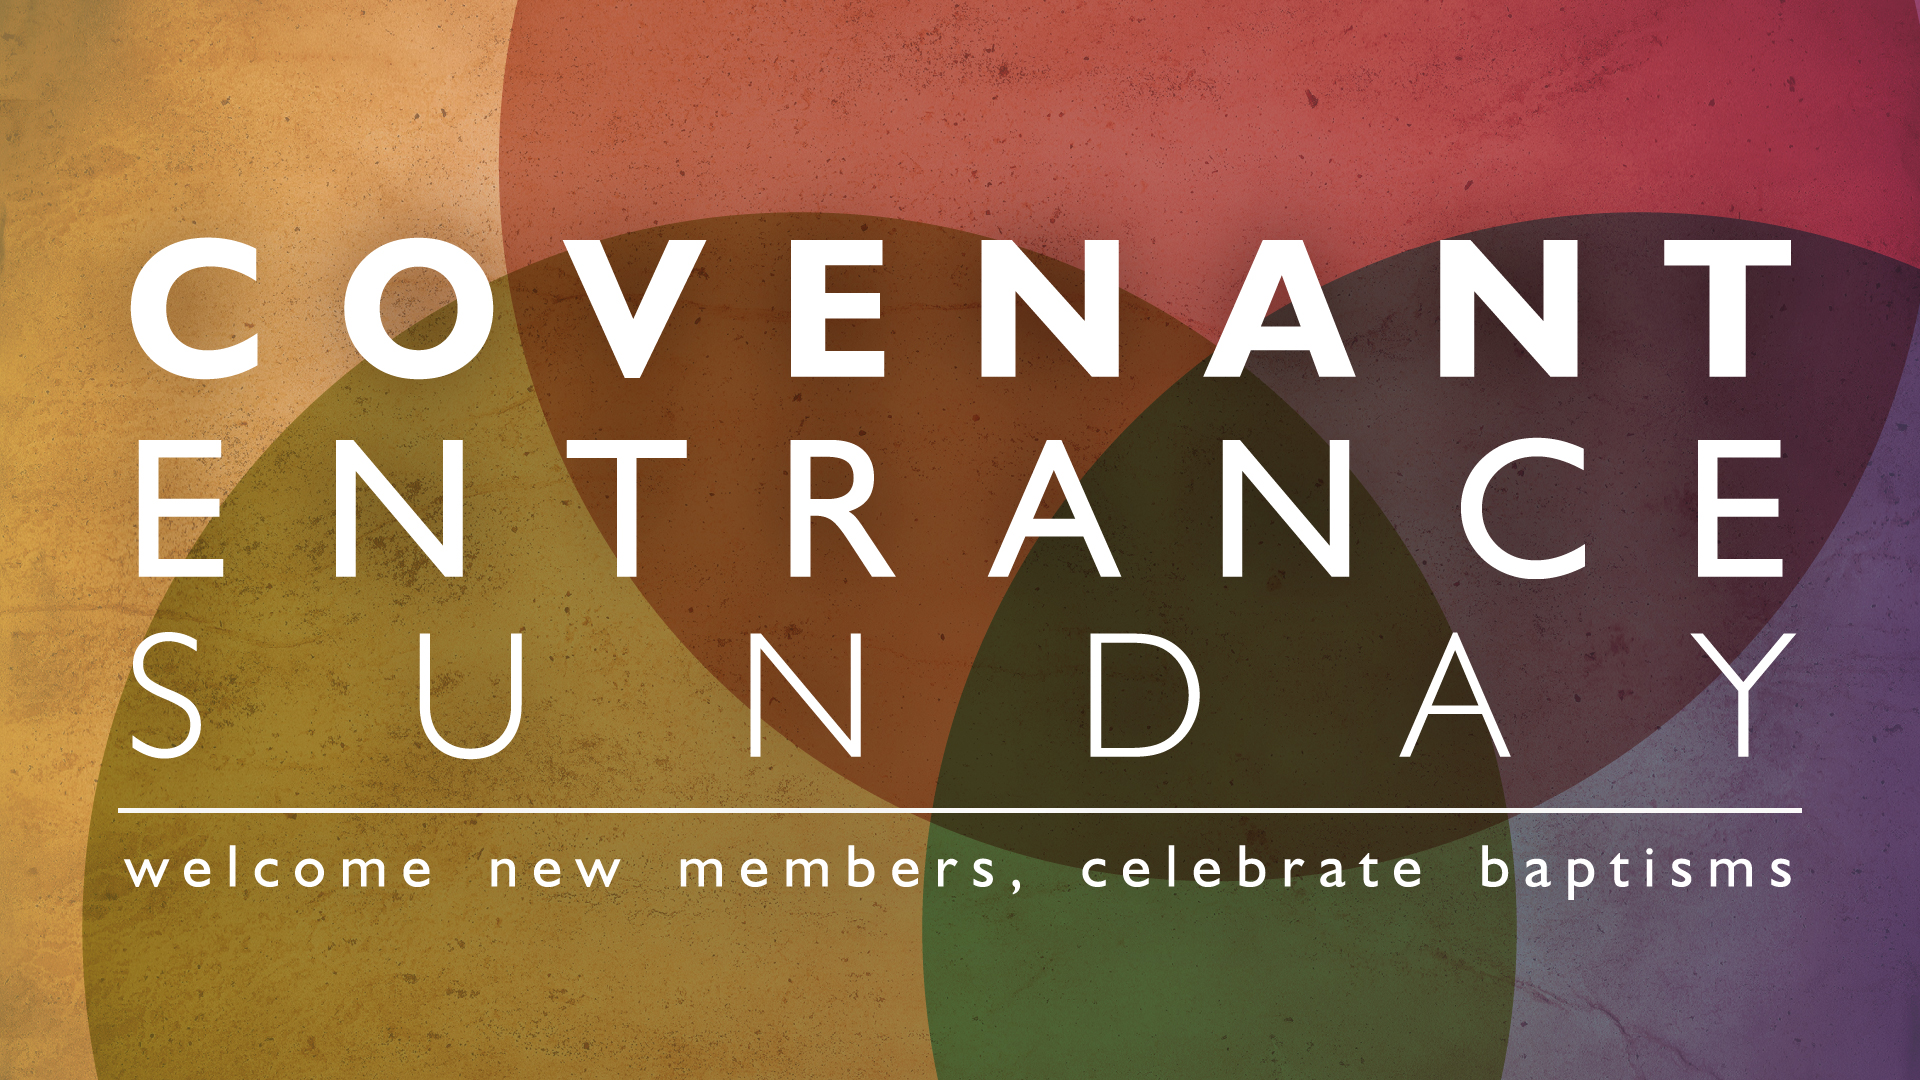 covenant_entrance_nodate.jpg